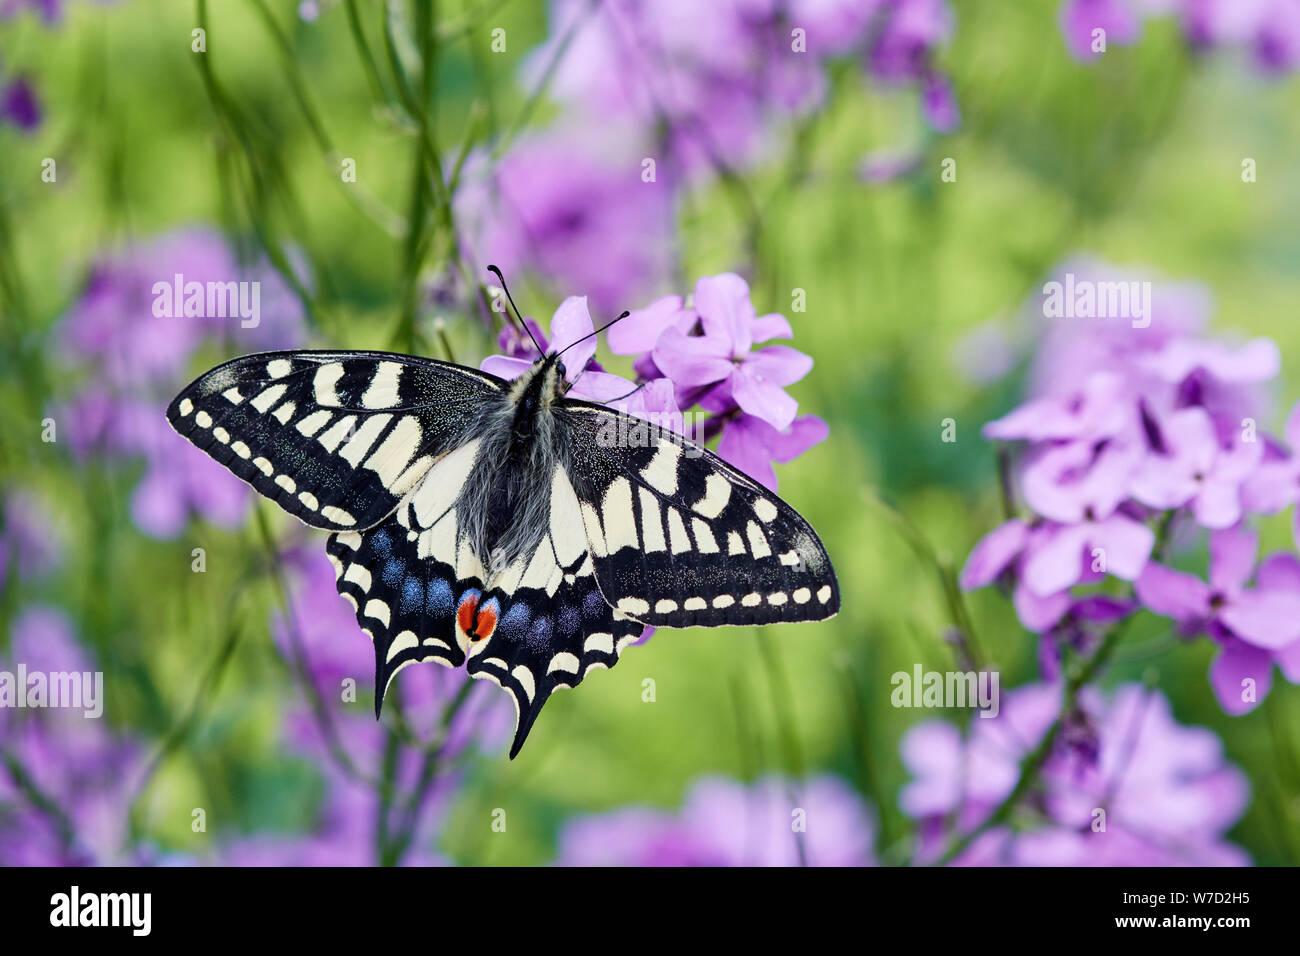 Especie de mariposa Papilio machaon britannicus (Reino Unido) Foto de stock